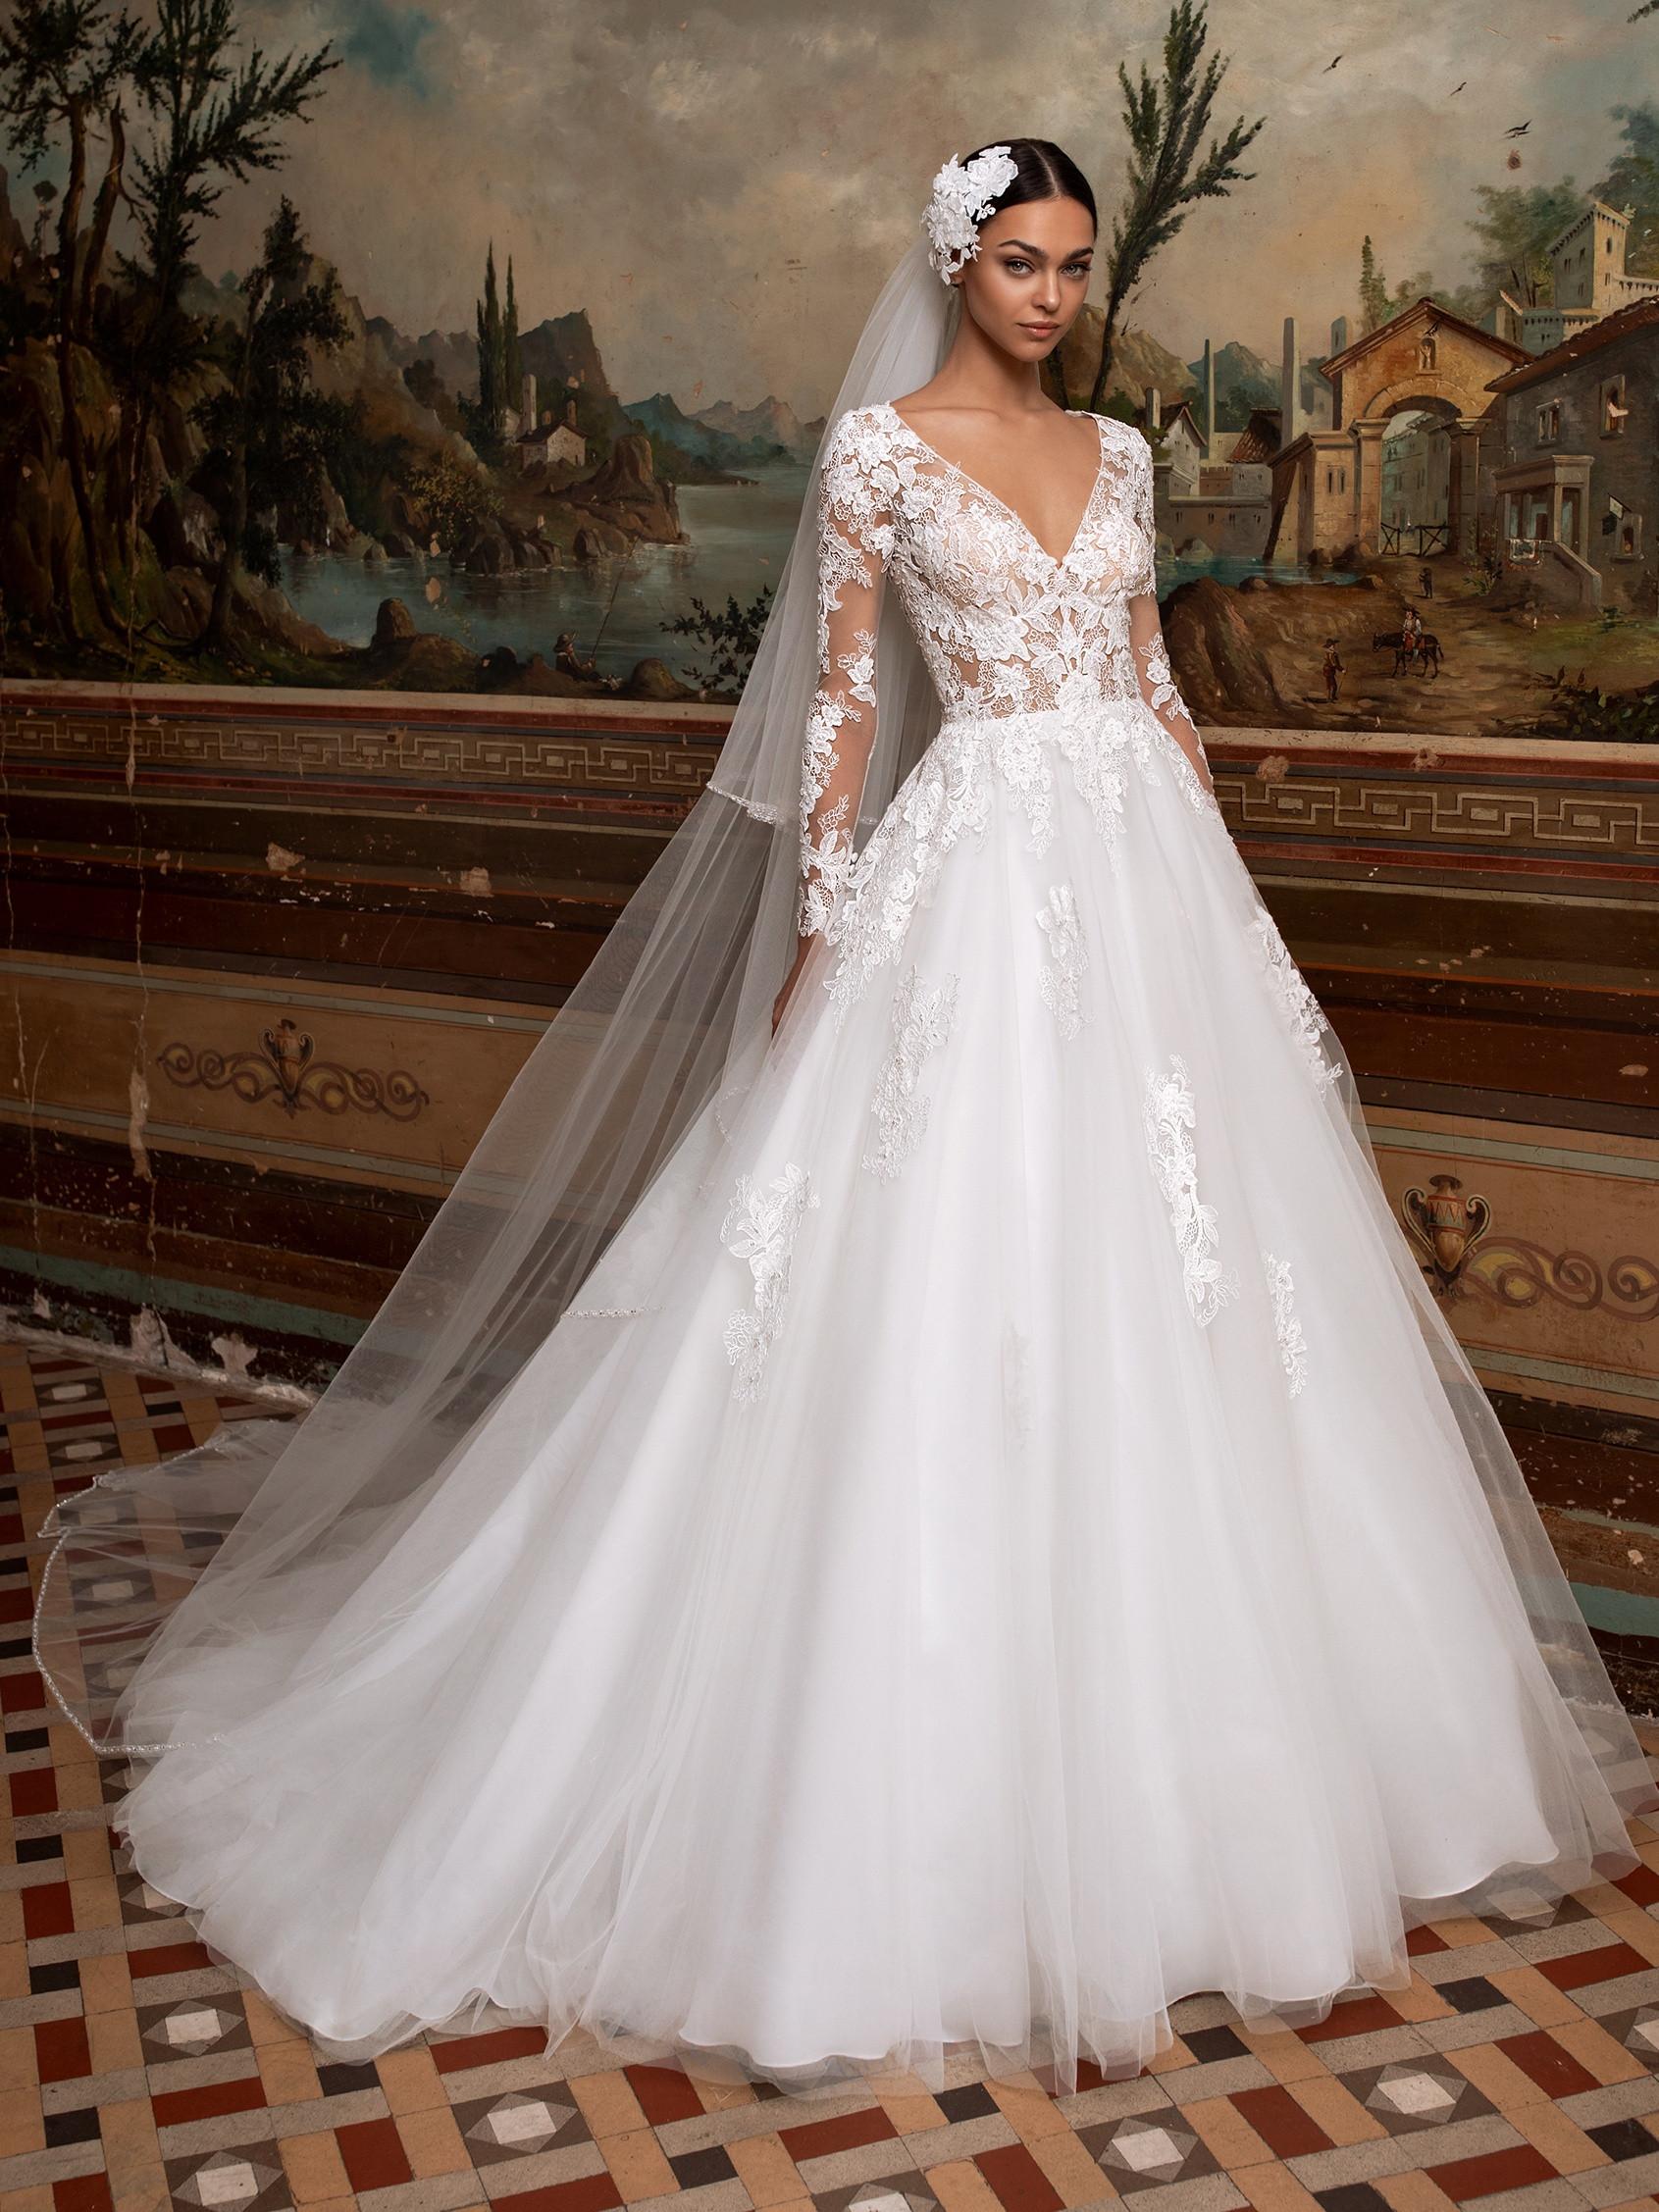 Circinus menyasszonyi ruha - Pronovias 2021